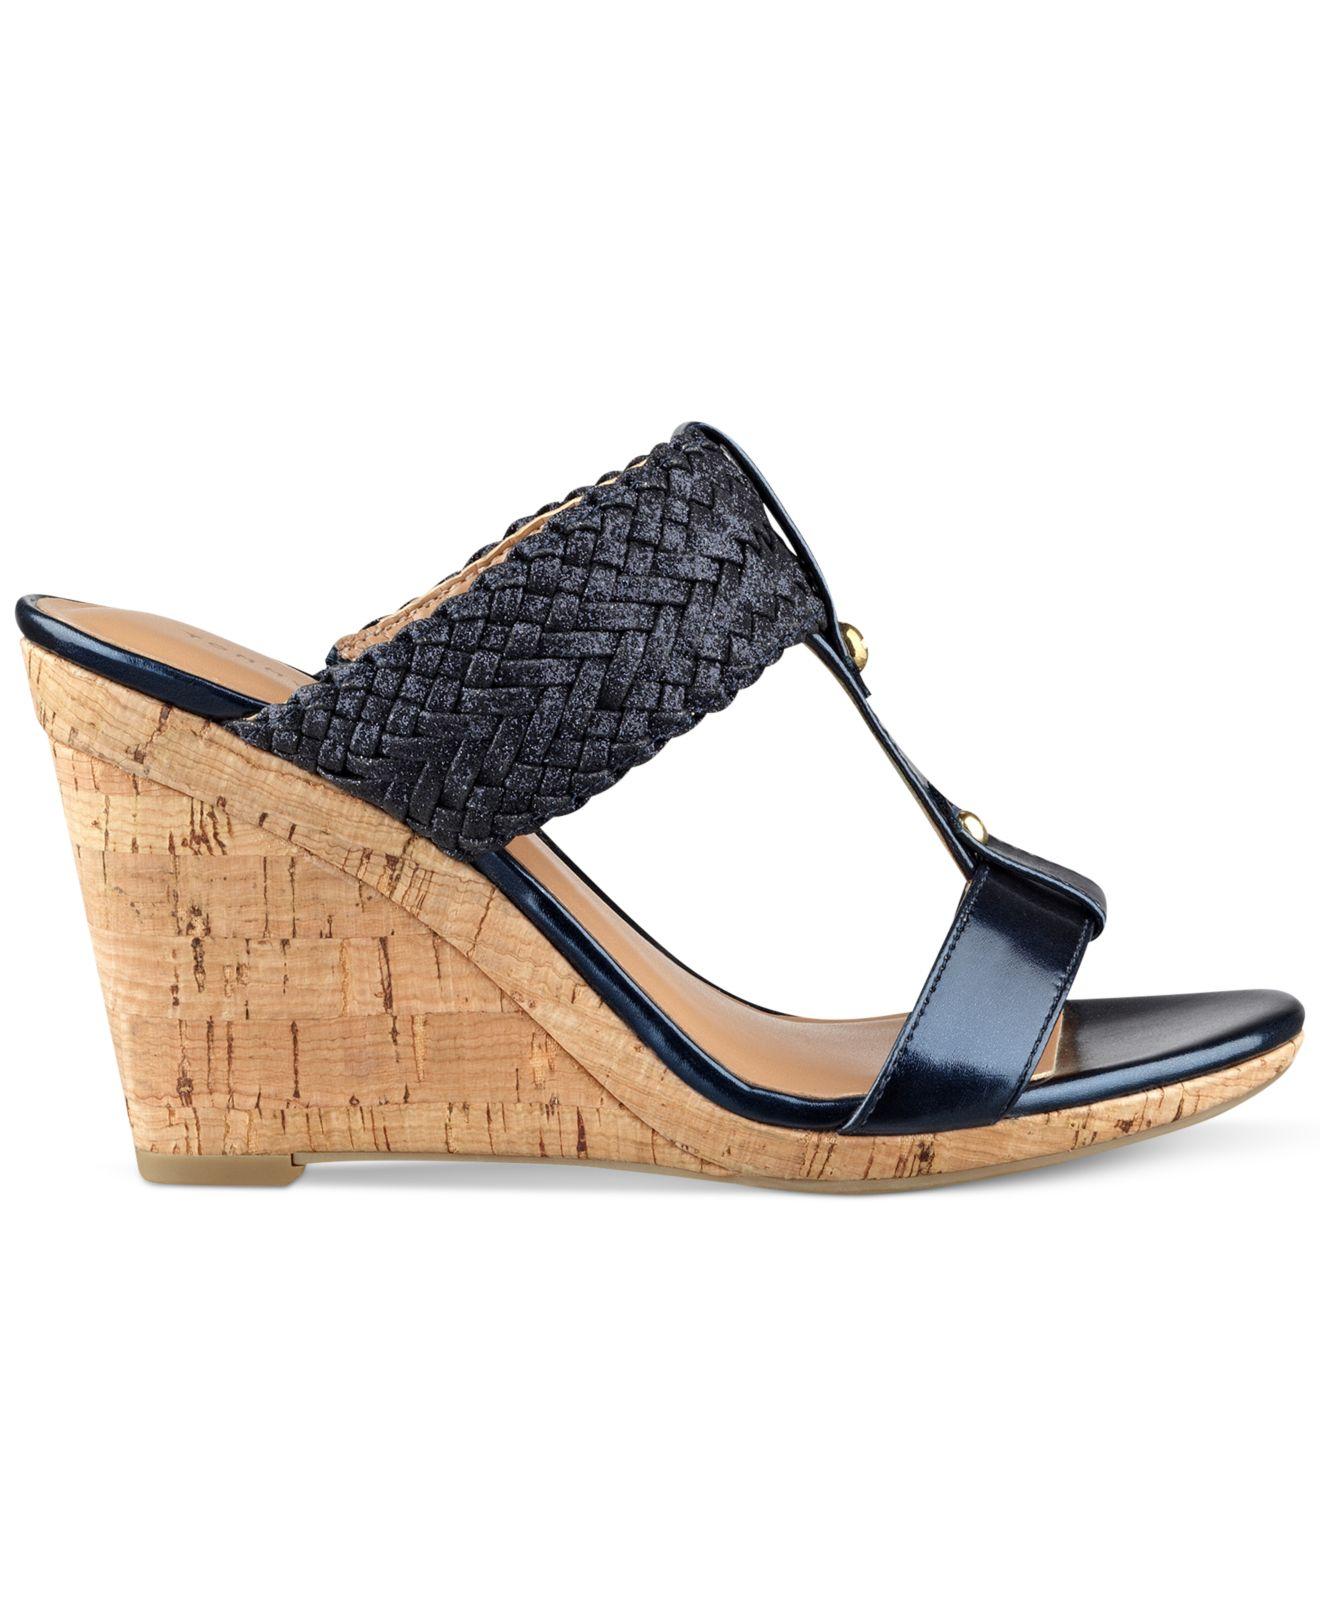 Lyst Tommy Hilfiger Women S Eleona Wedge Sandals In Blue